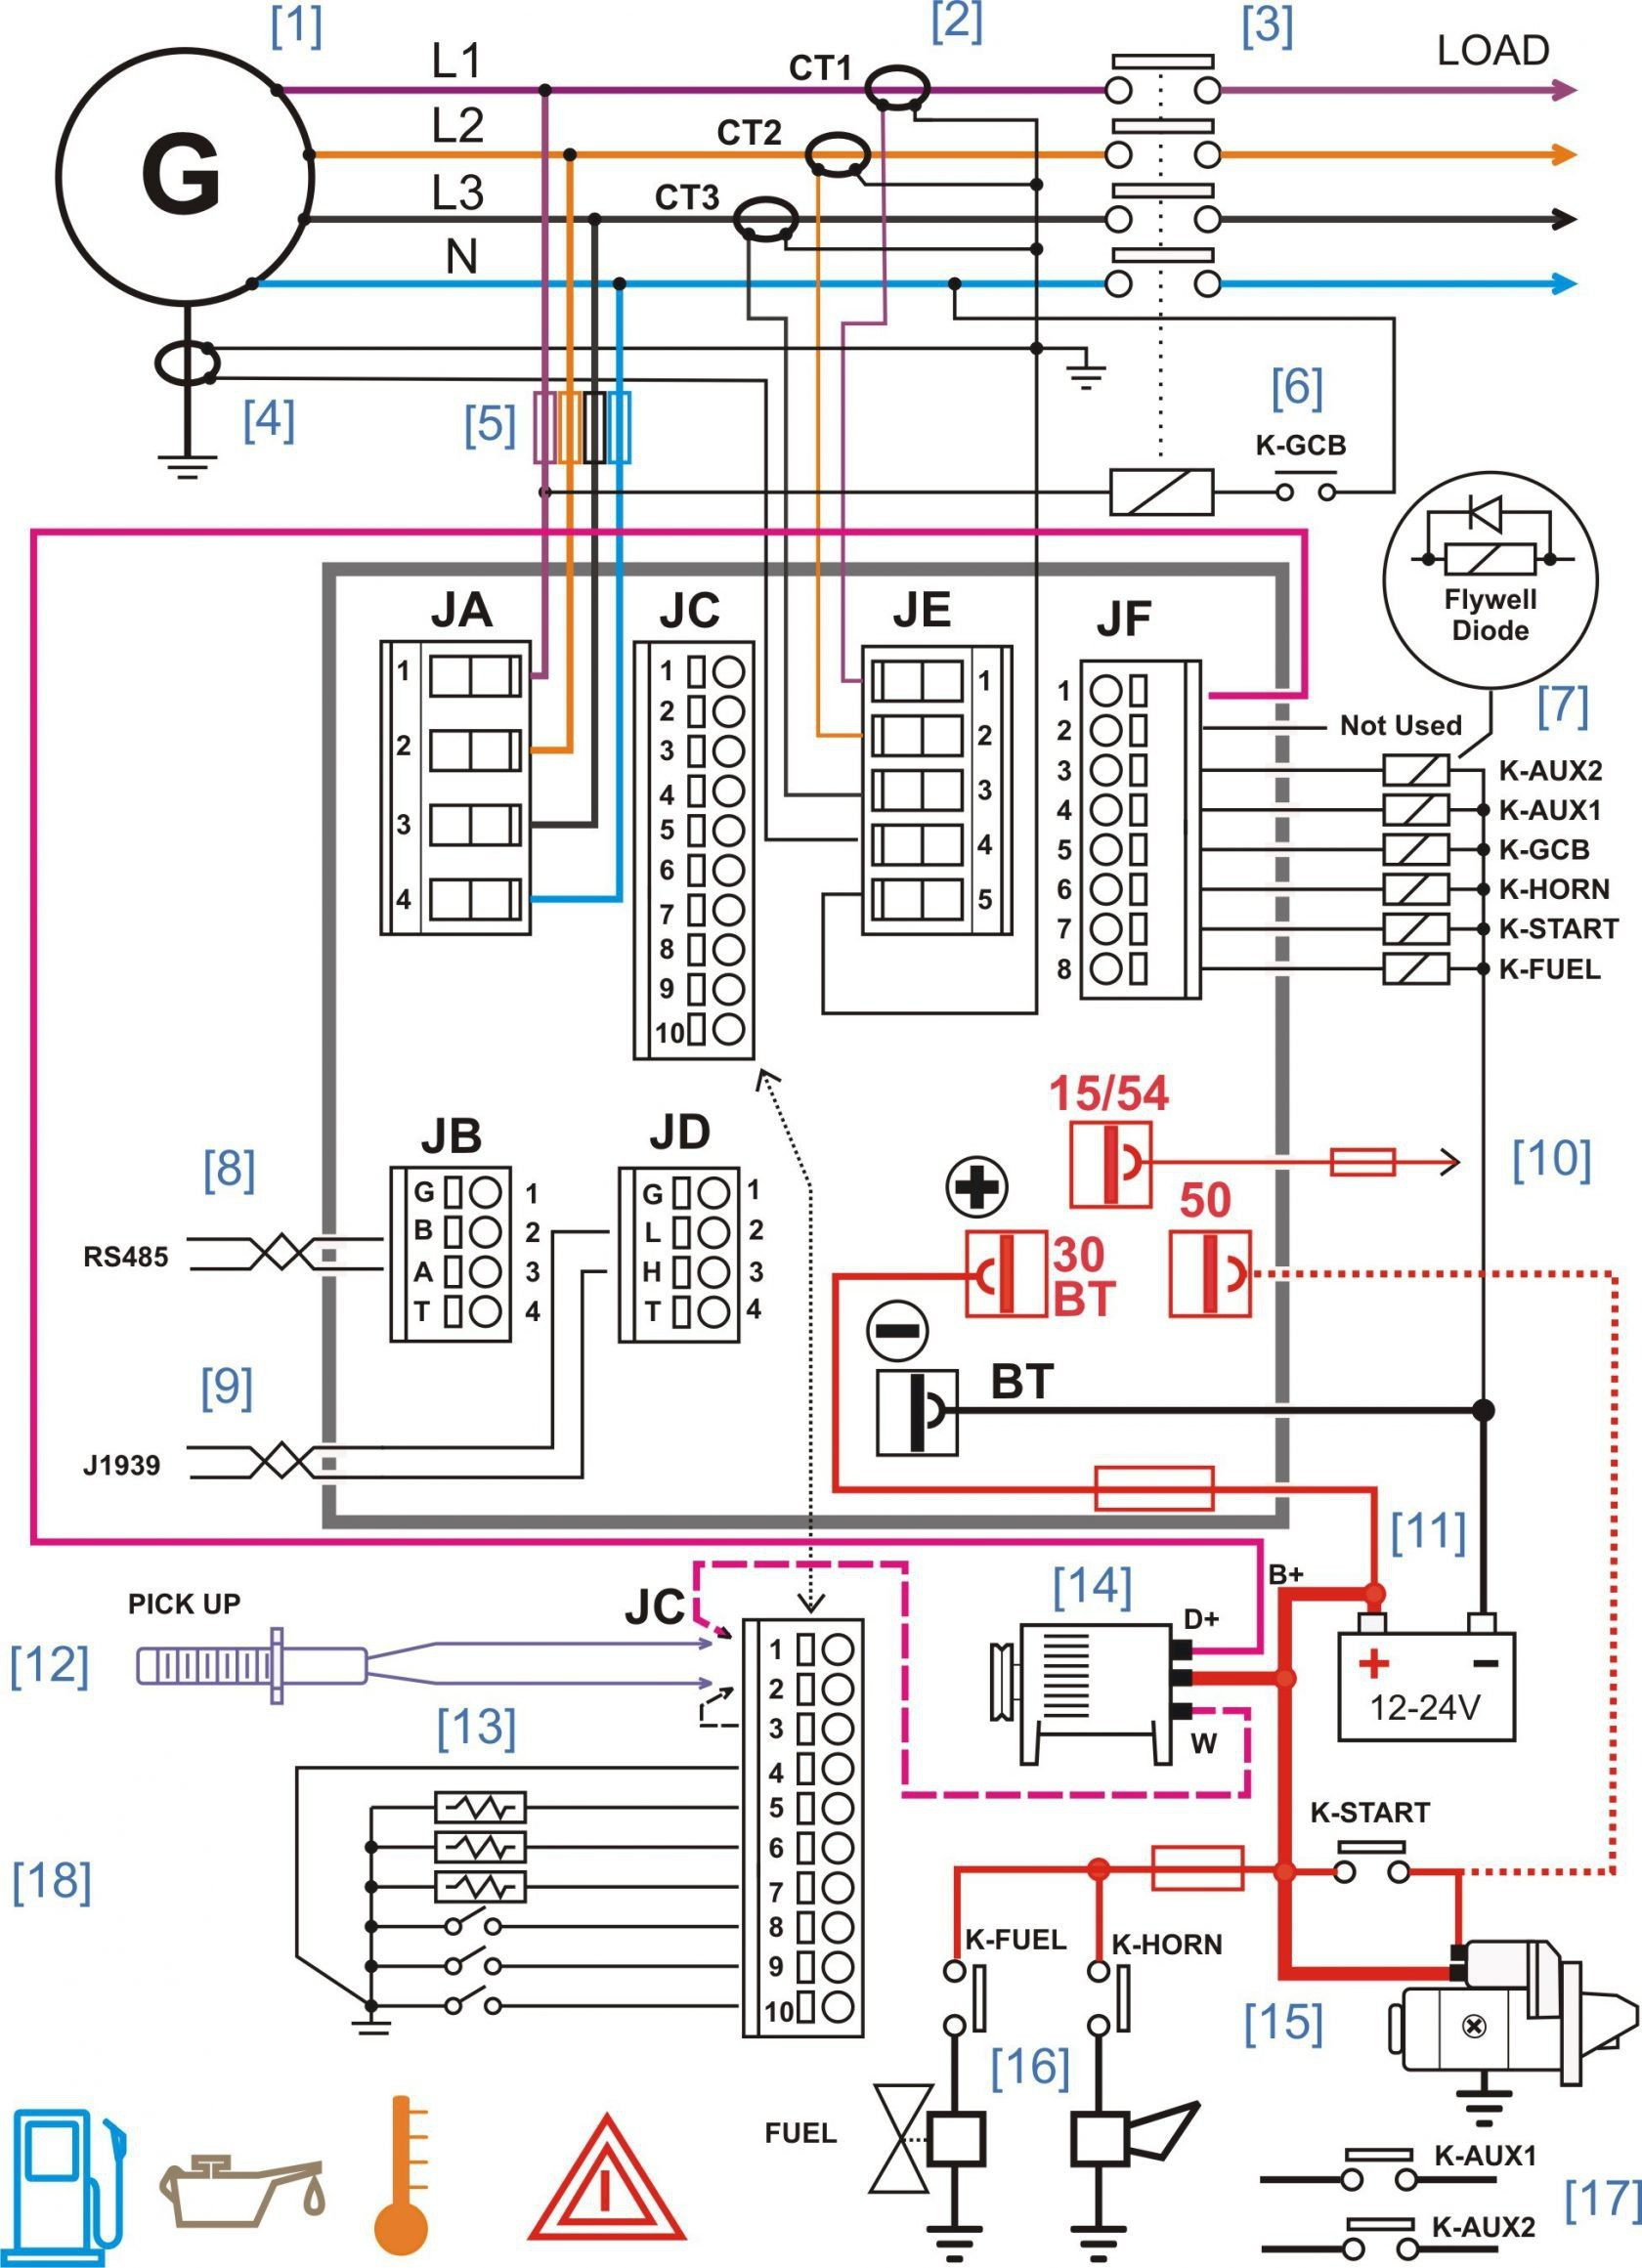 Jvc Car Stereo Wiring Diagram Fresh Jvc Kd Sr72 Wiring Diagram Elegant Car Stereo Wiring Diagrams